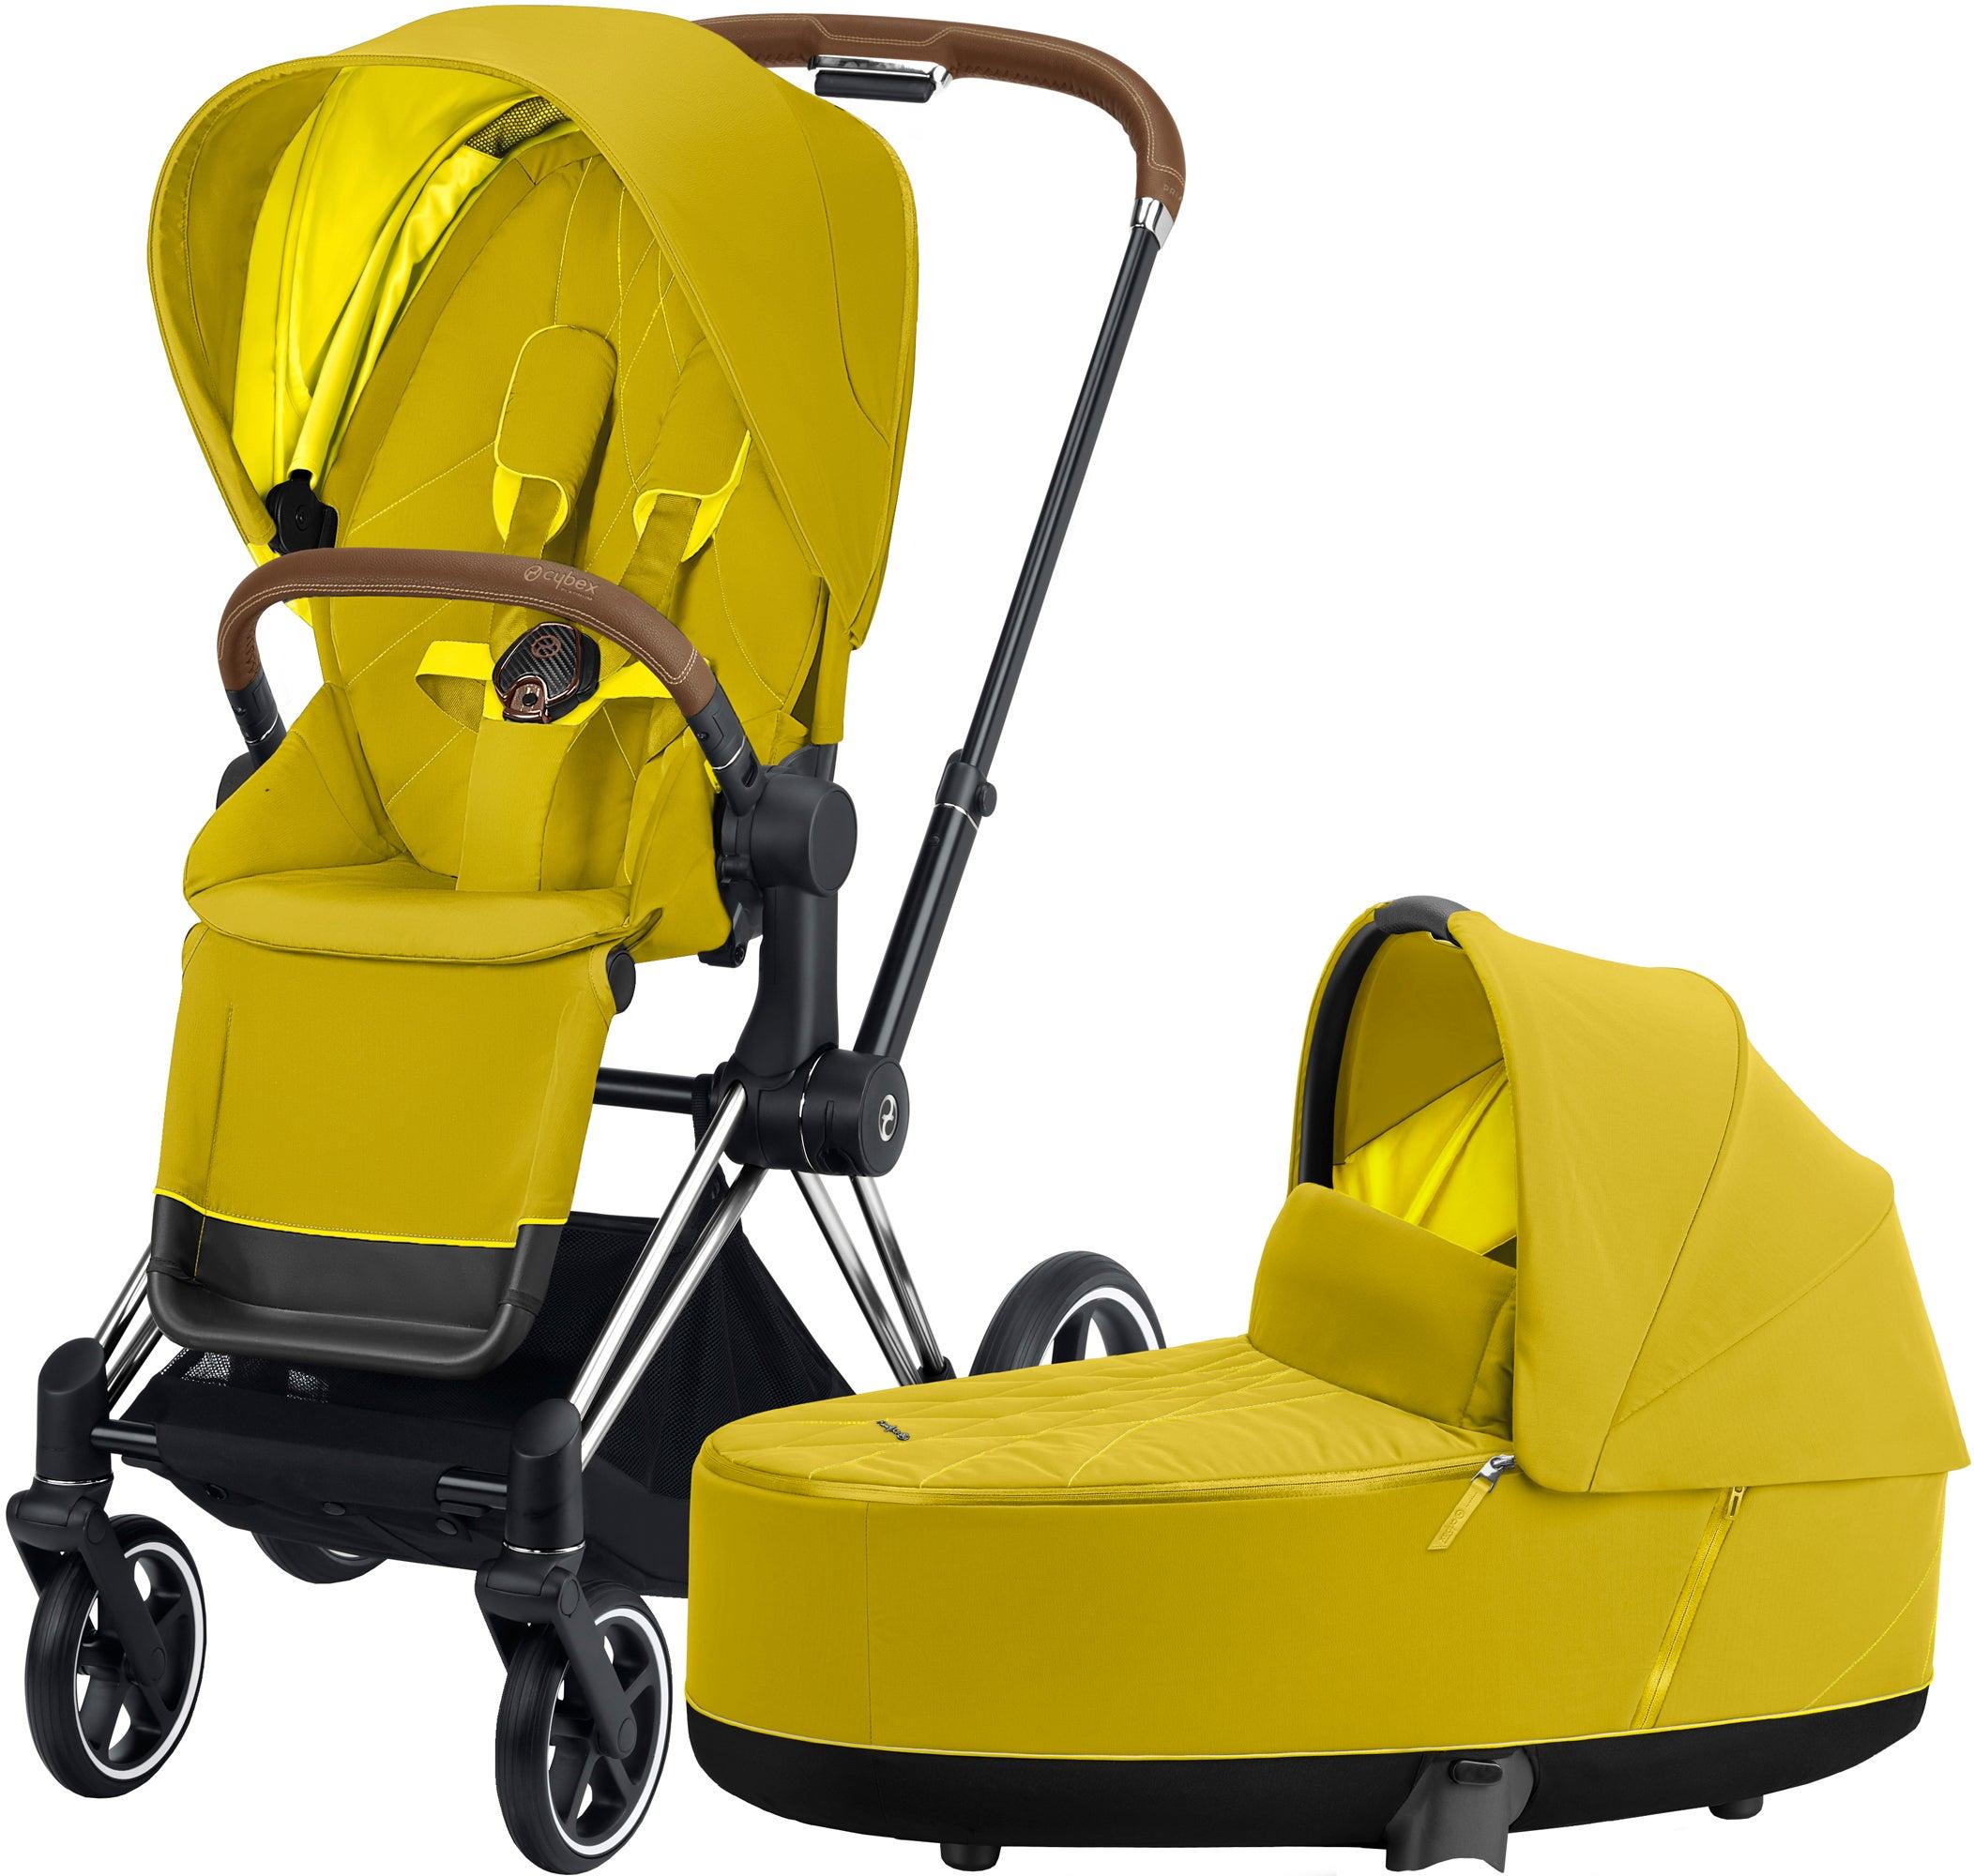 Cybex Priam Duovagn, Mustard Yellow/Chrome Brown